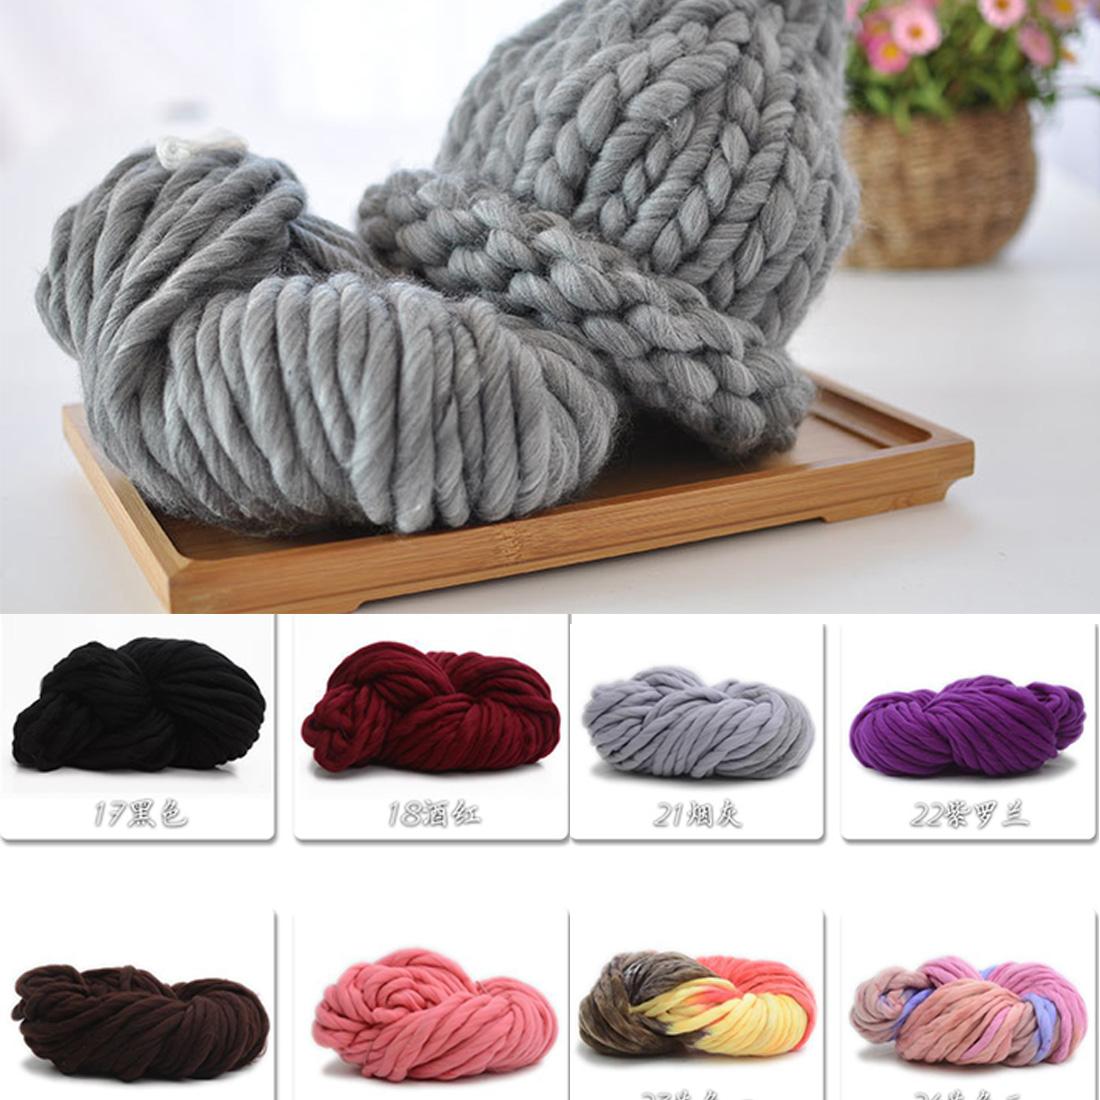 Crocheting Yarn For Sale : Beautiful Soft Acrylic Yarn Thick for Knitting Baby Wools Crochet Yarn ...